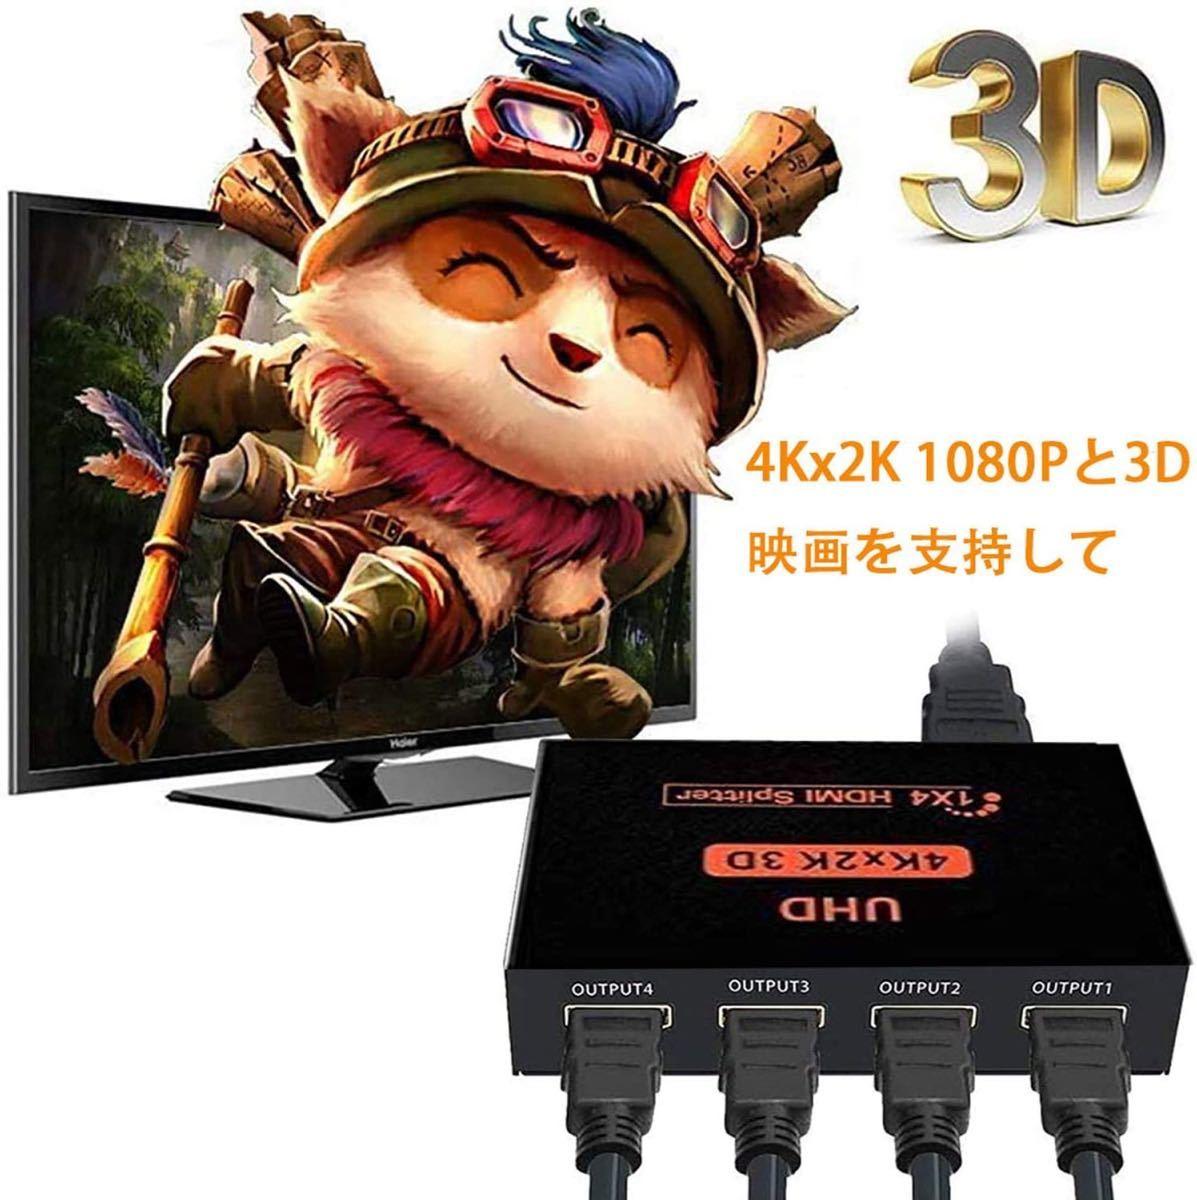 HDMI 分配器 HDMIスプリッター 1入力 4出力 4画面 同時出力 4K